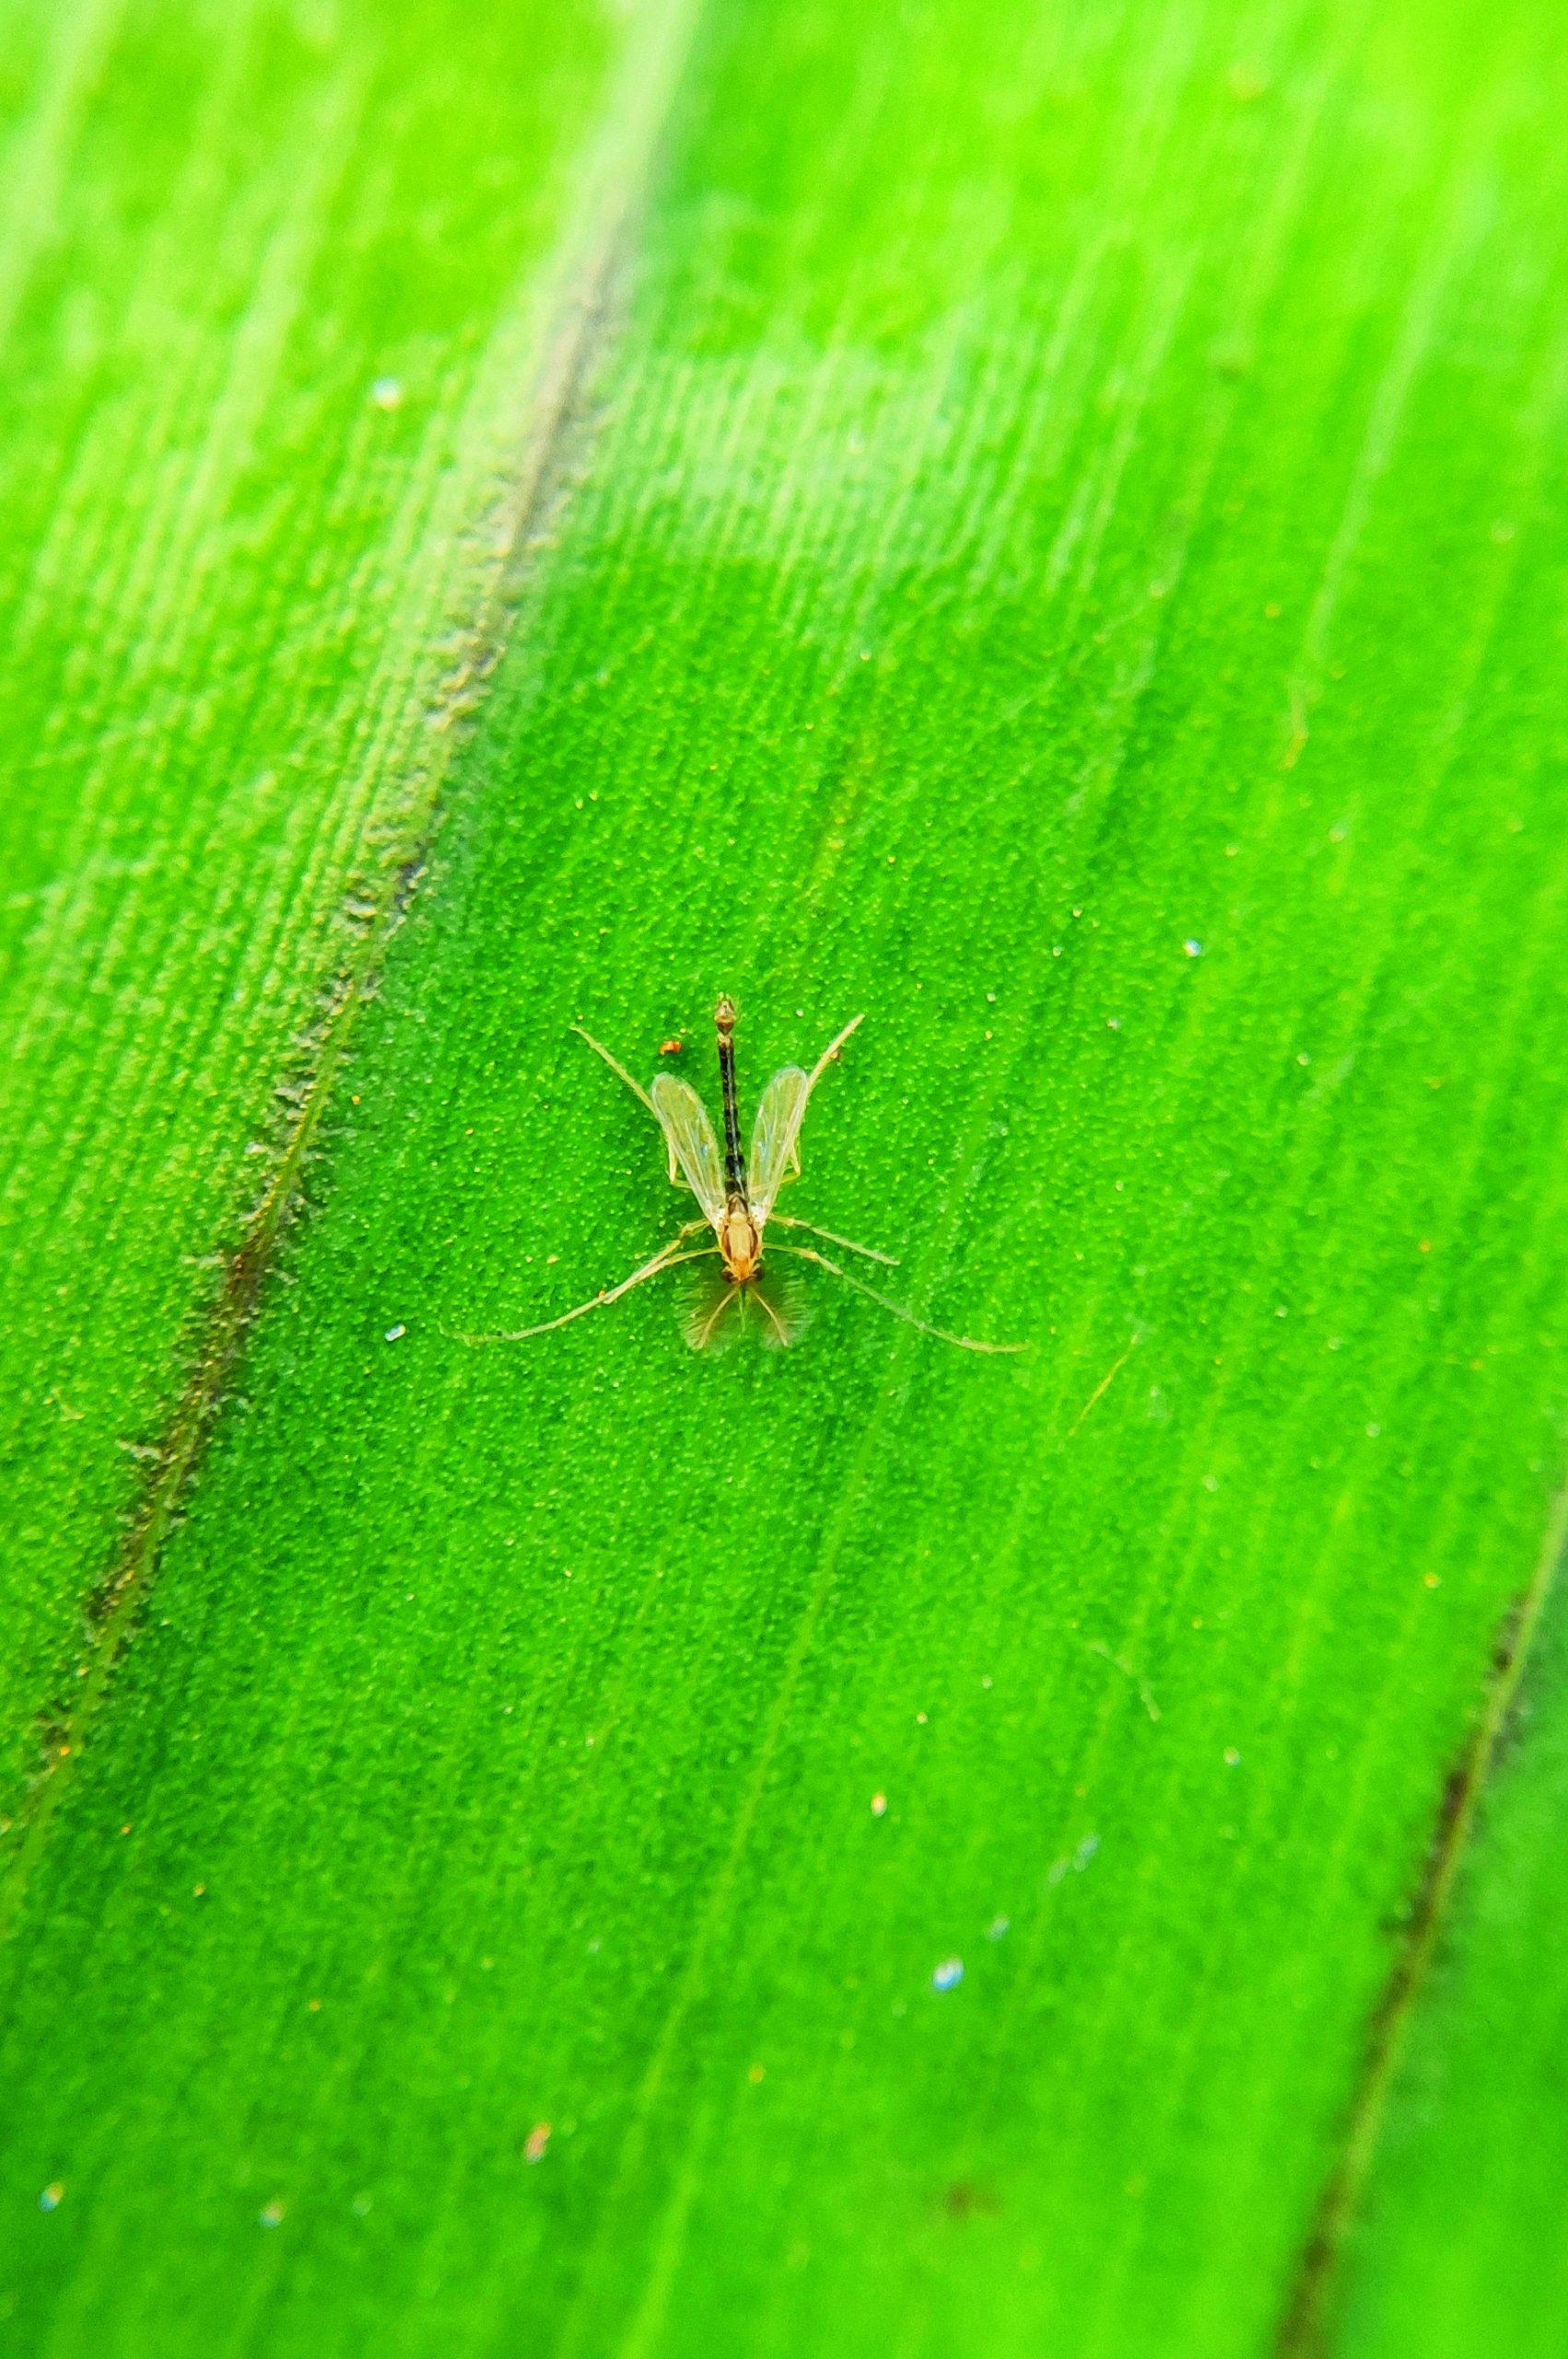 Tiny fly on banana leaf